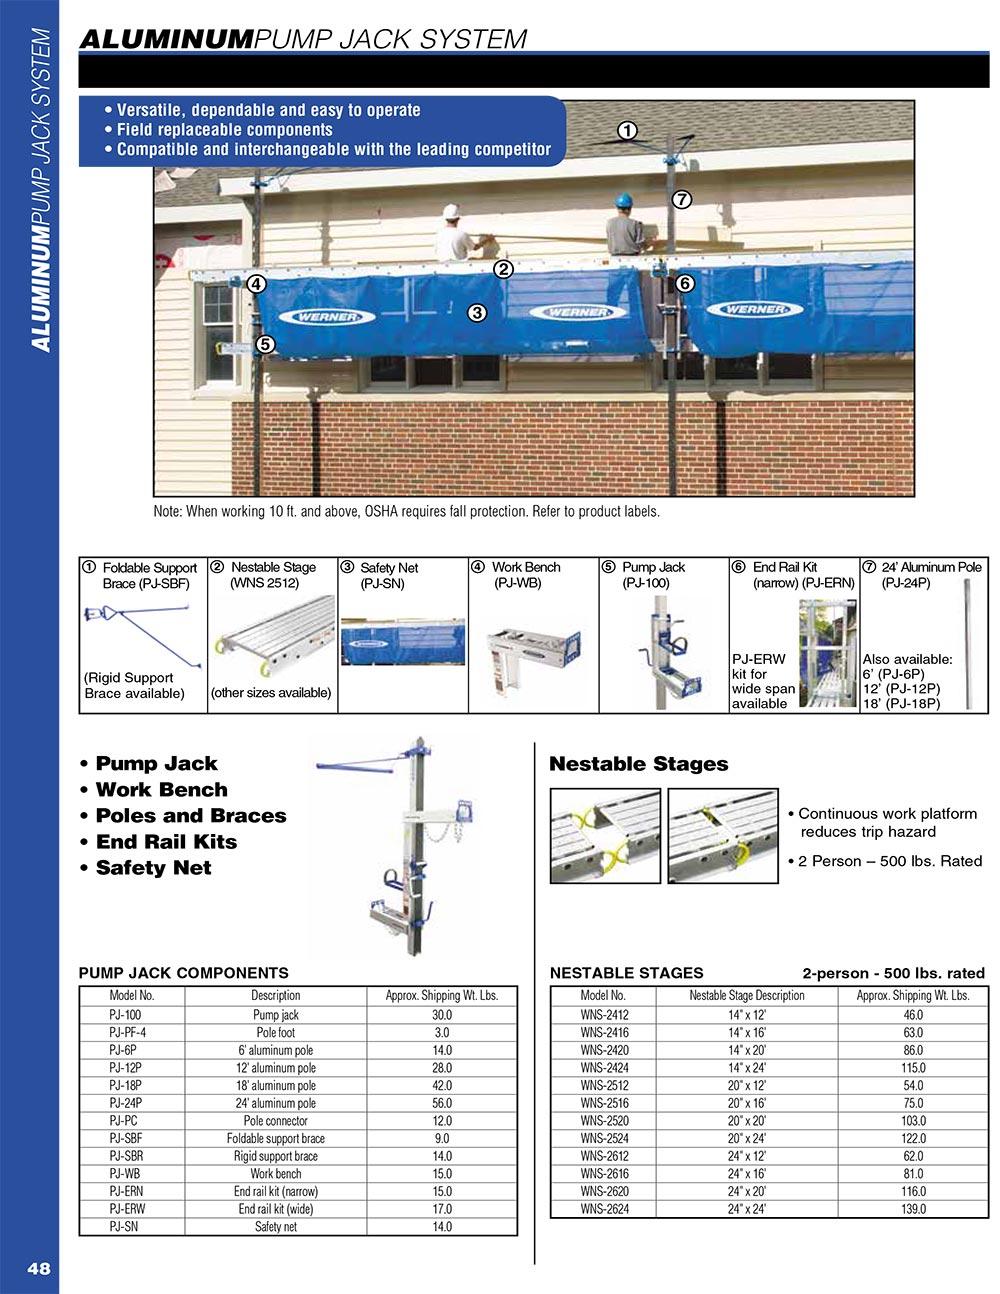 Werner Aluminum Pump Jacks And Nestable Stages